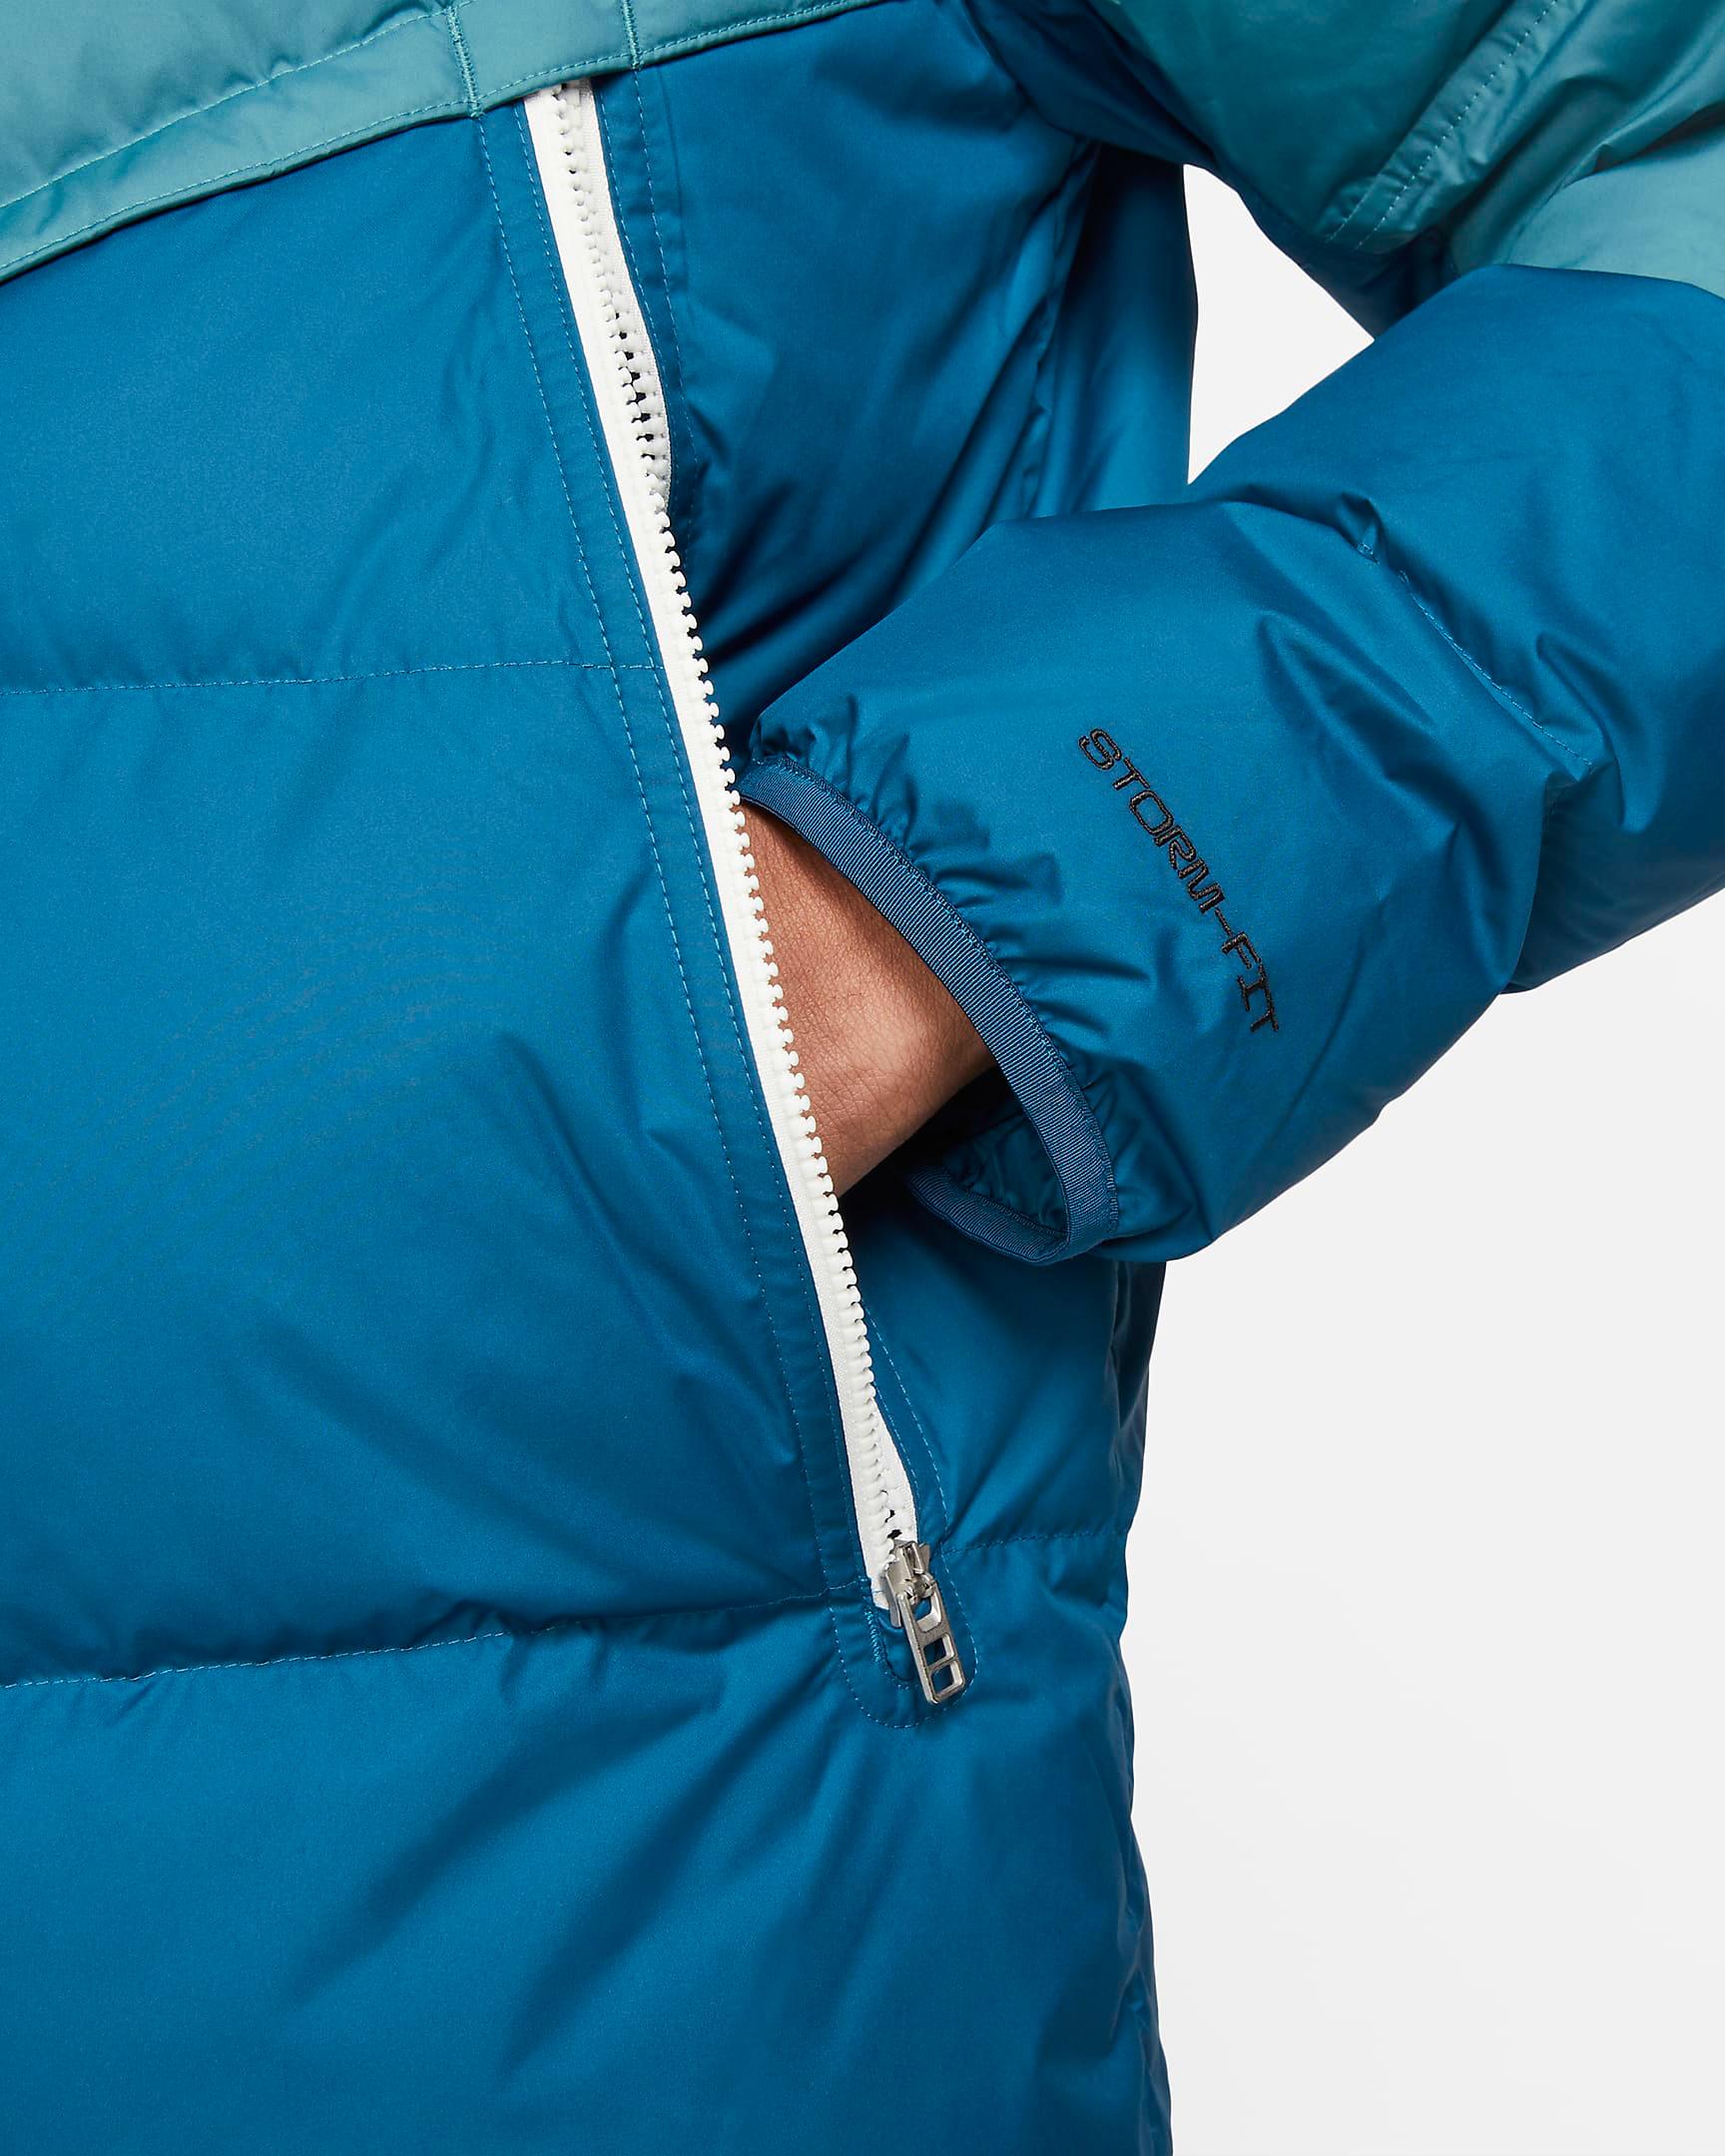 nike-sportswear-storm-fit-windrunner-jacket-rift-blue-court-blue-sail-4